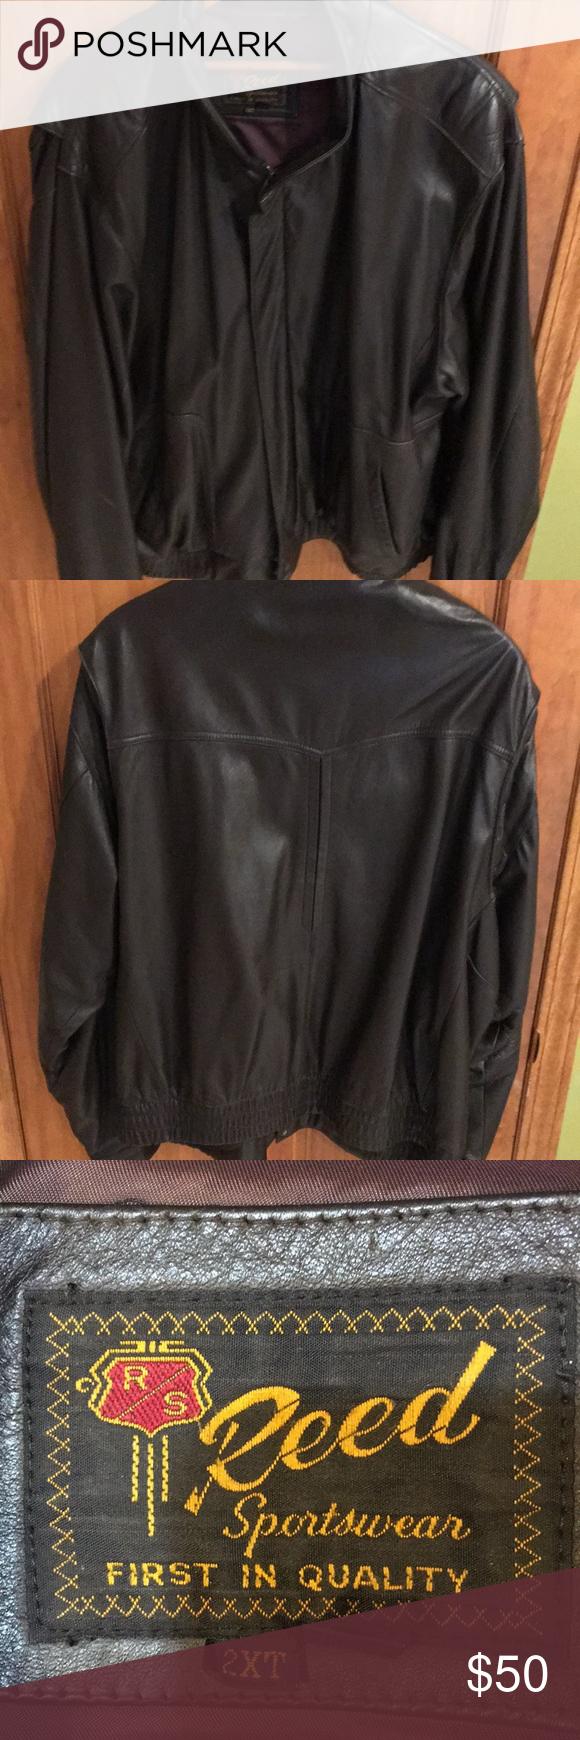 Men S Leather Jacket 2xl Dark Brown Leather Jacket Genuine Leather Jackets Men S Leather Jacket [ 1740 x 580 Pixel ]